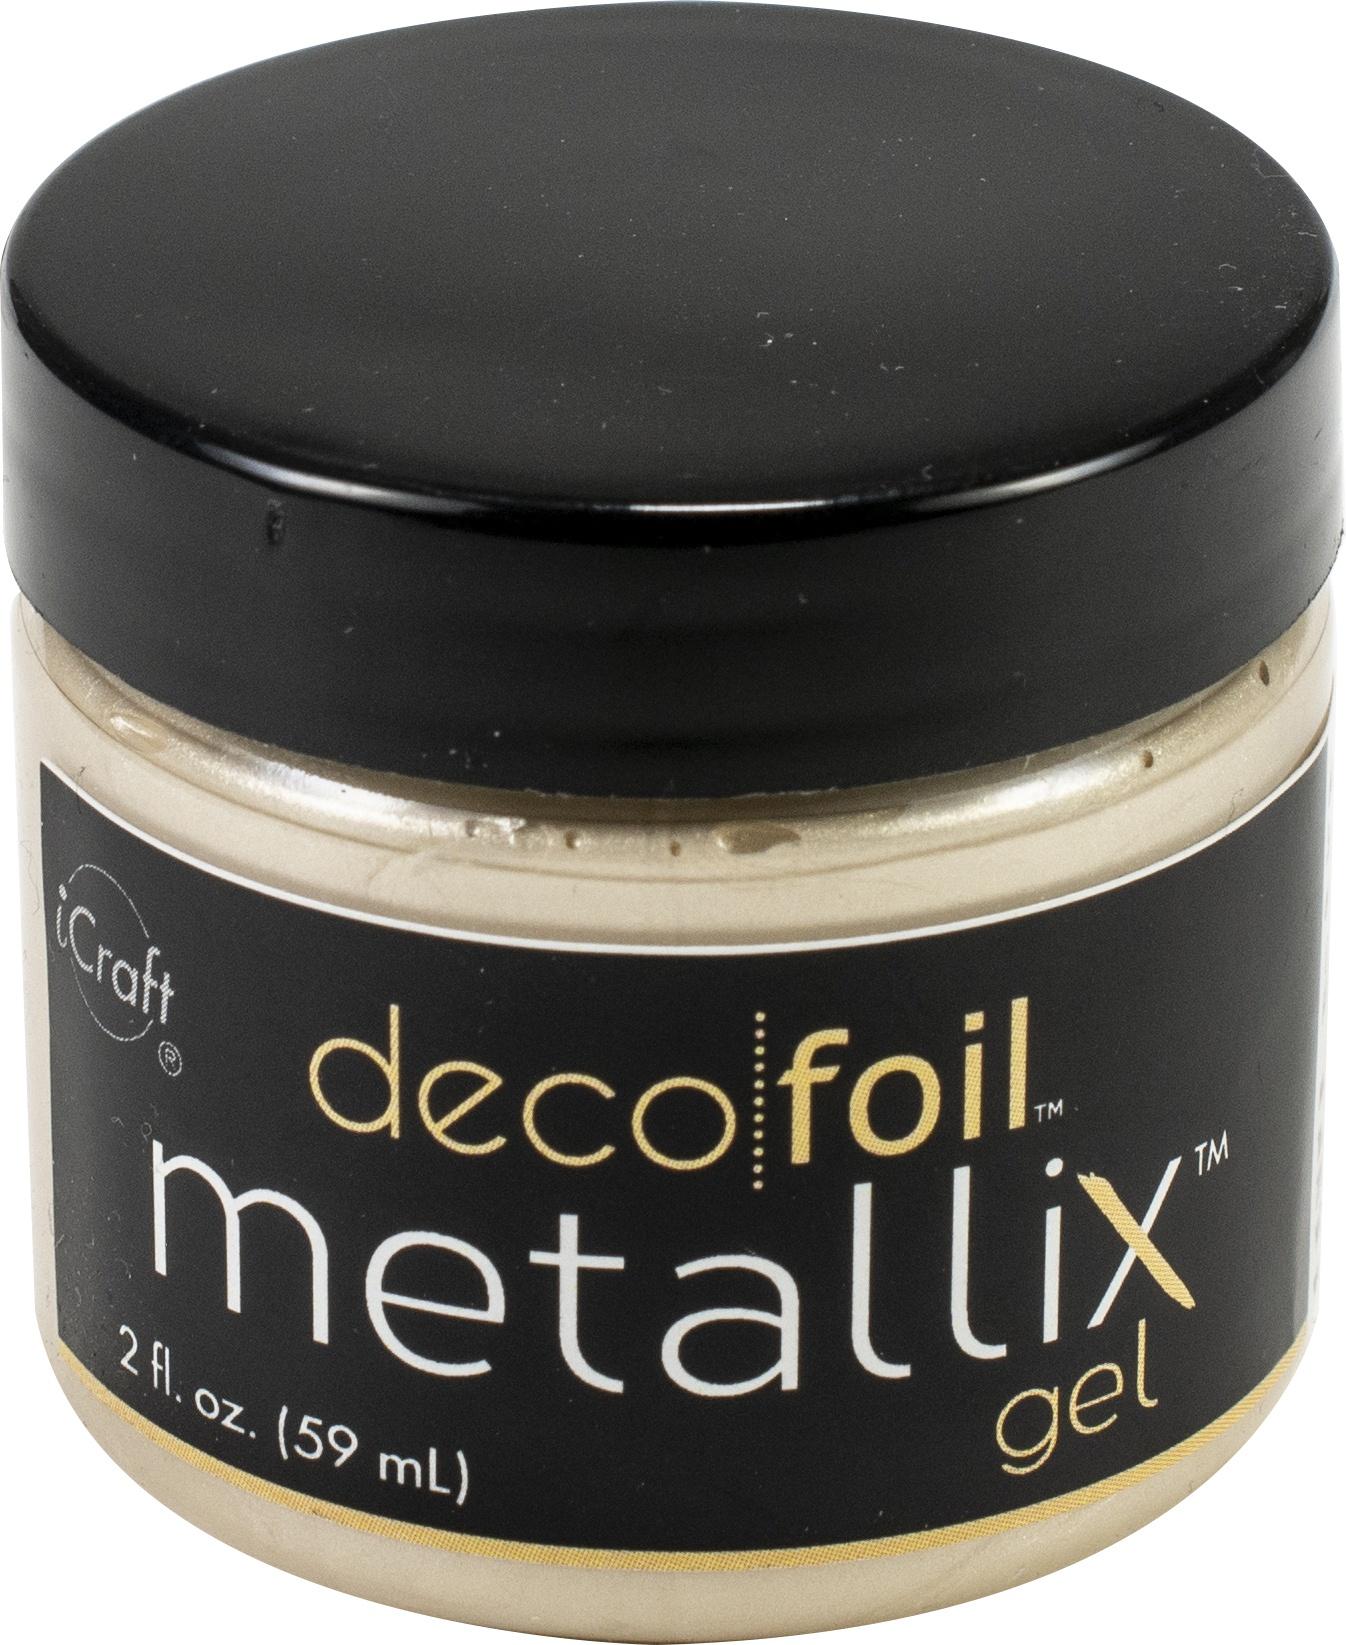 Deco Foil Metallix Gel Champagne Mist